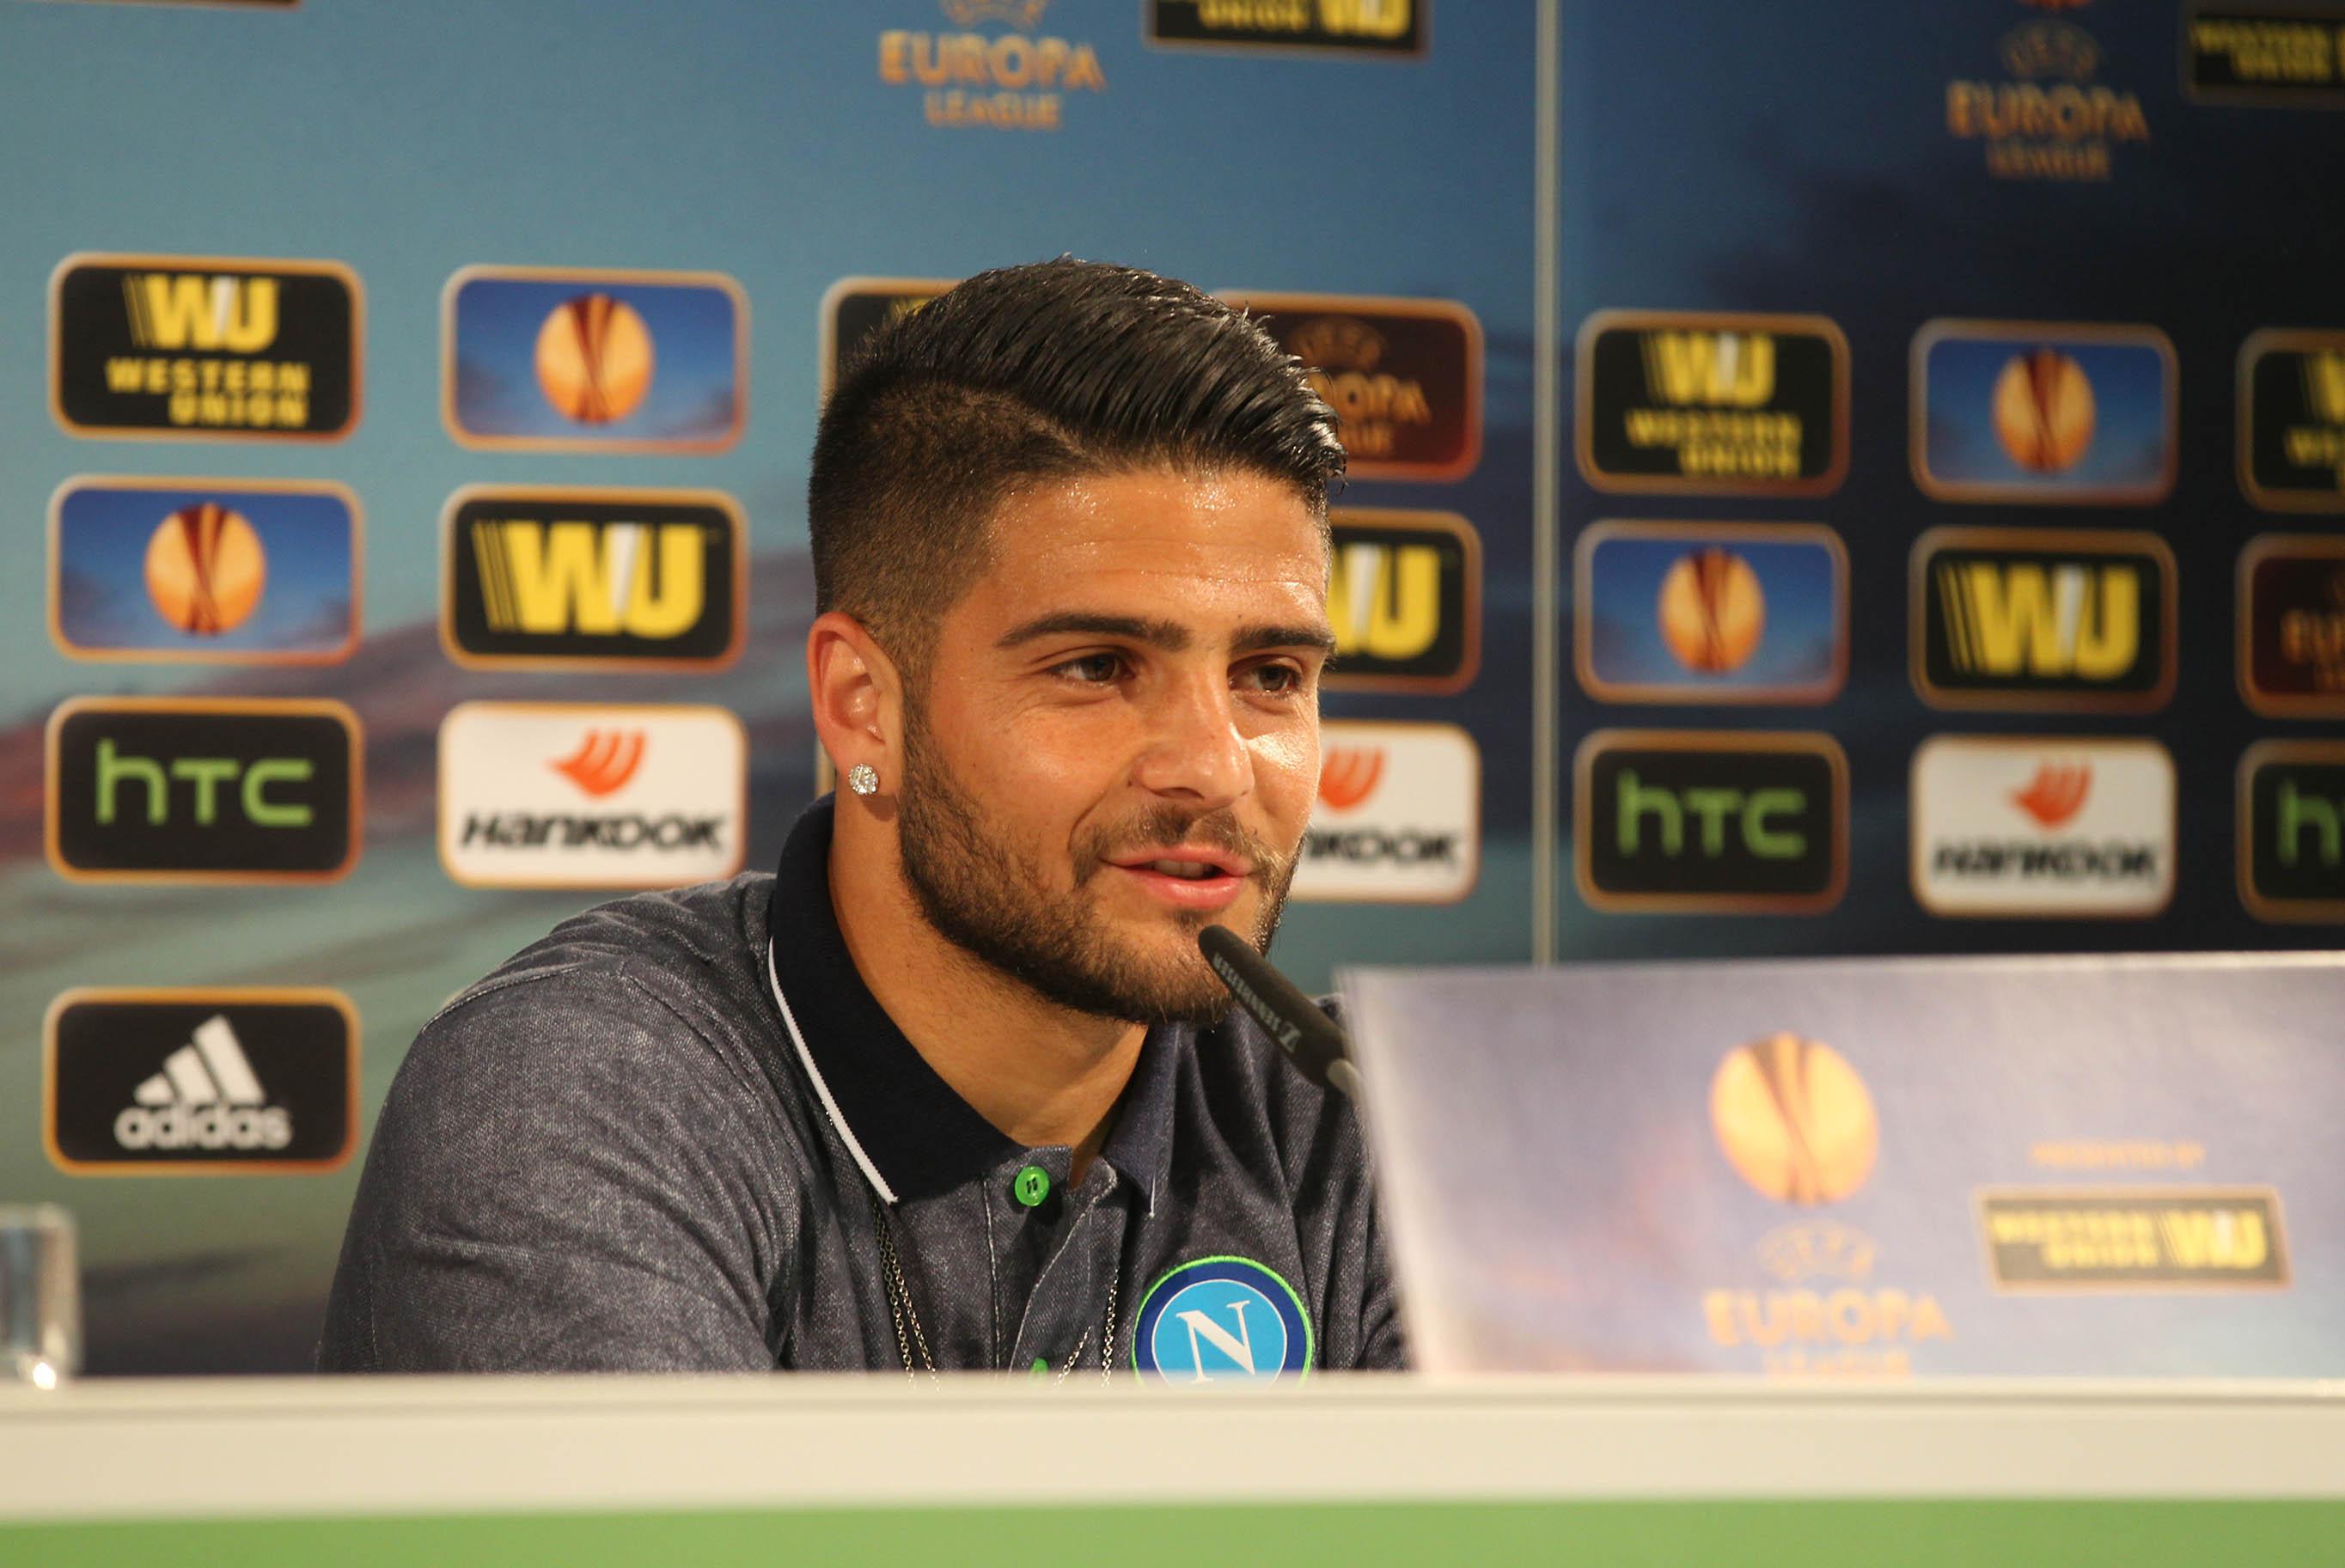 Conferenza stampa Wolfsburg Napoli Benitez Insigne